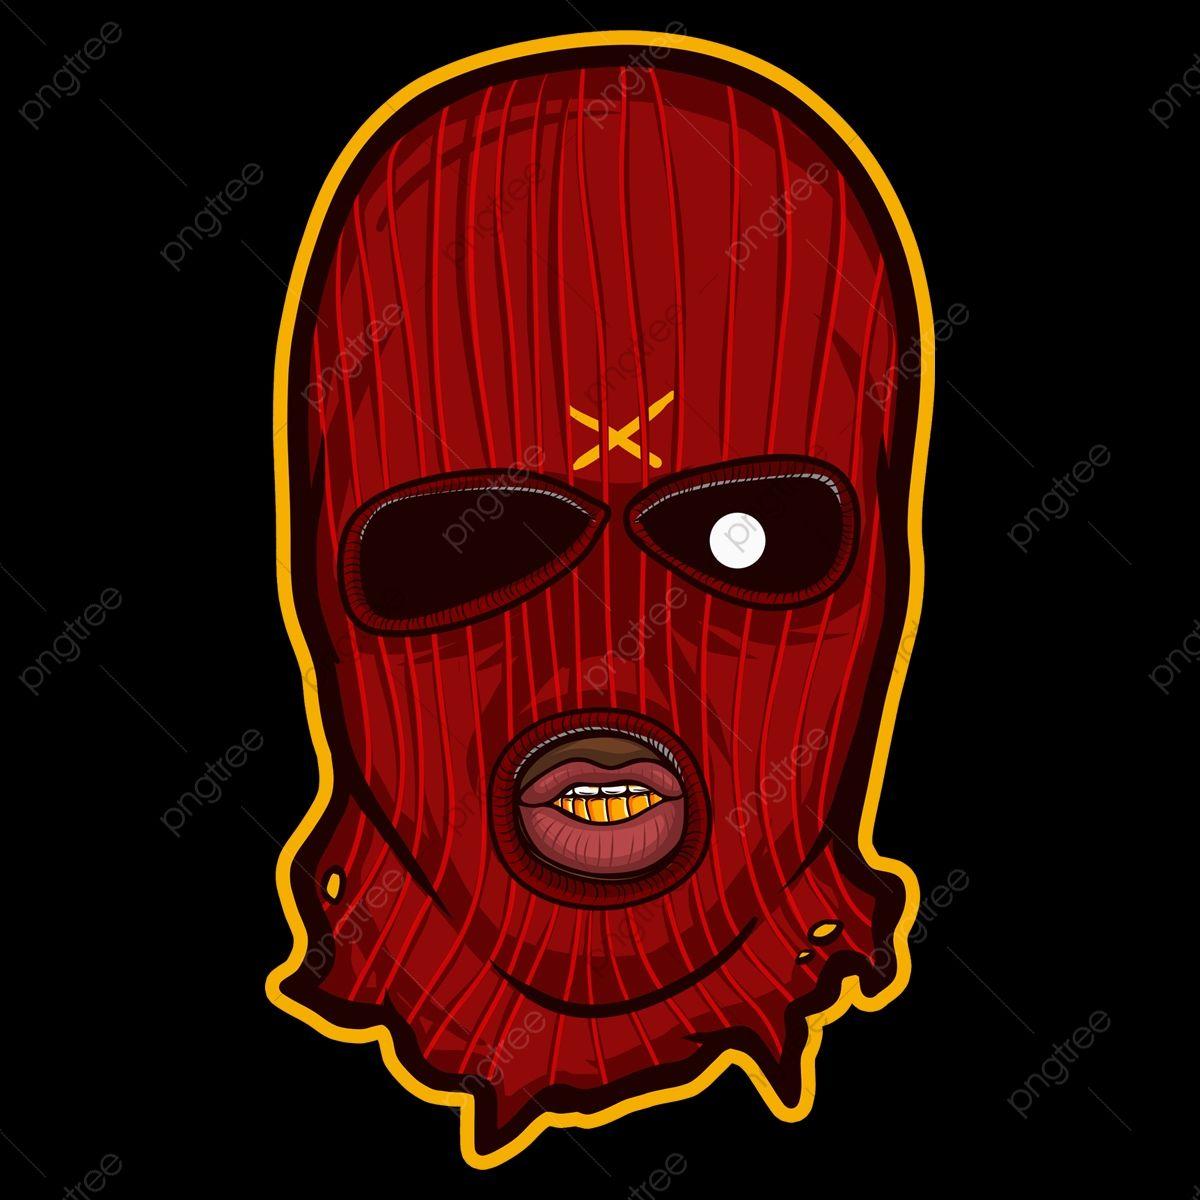 Angry Ski Mask Cartoon Art Artwork Illustration Png Transparent Clipart Image And Psd File For Free Download Masks Art Drip Art Ski Mask Tattoo